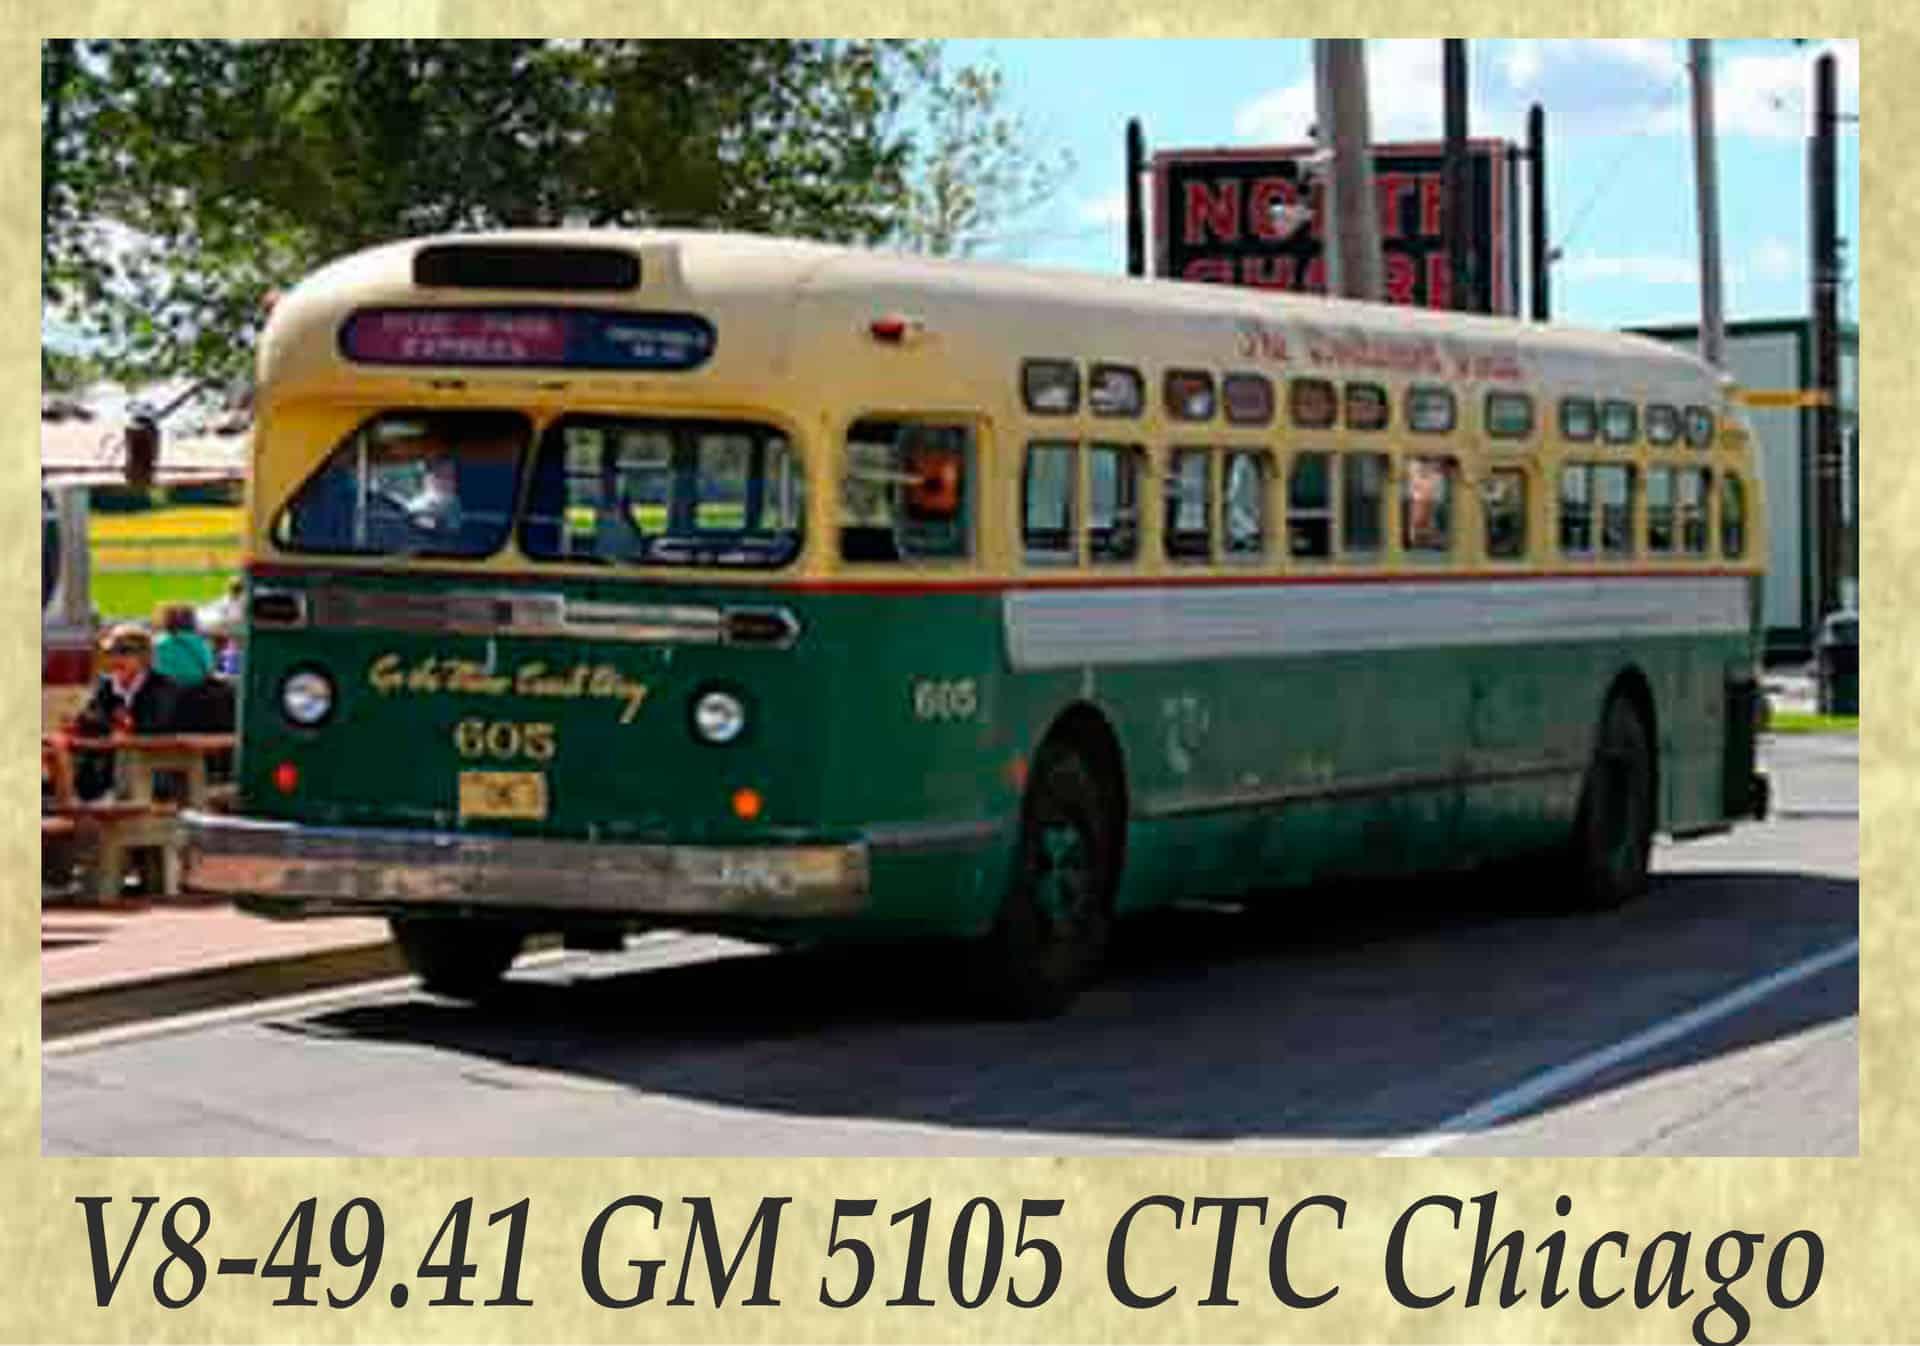 V8-49.41 GM 5105 CTC Chicago